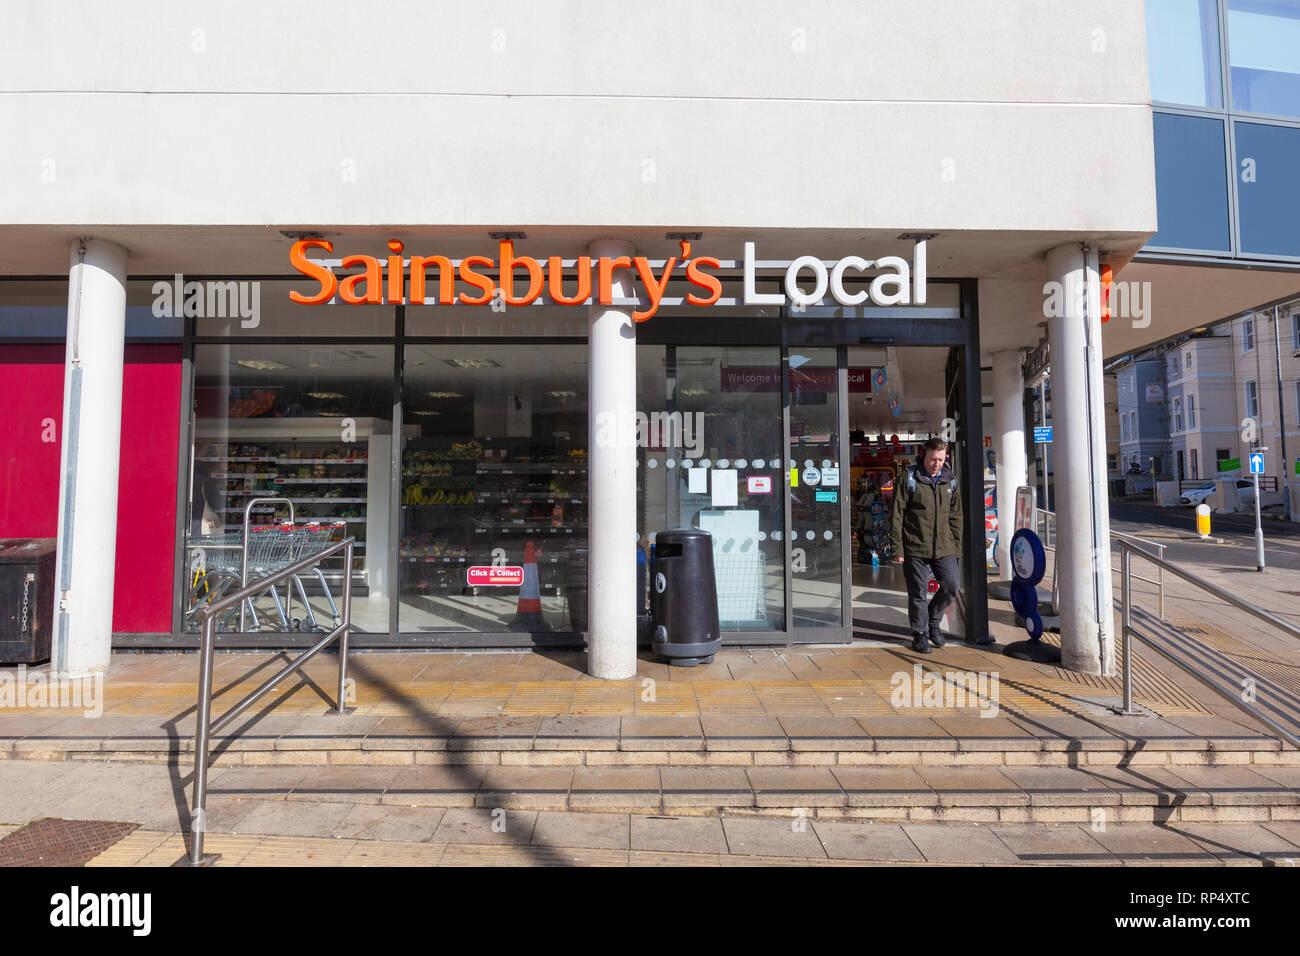 Sainsburys local, hastings, east sussex, uk - Stock Image